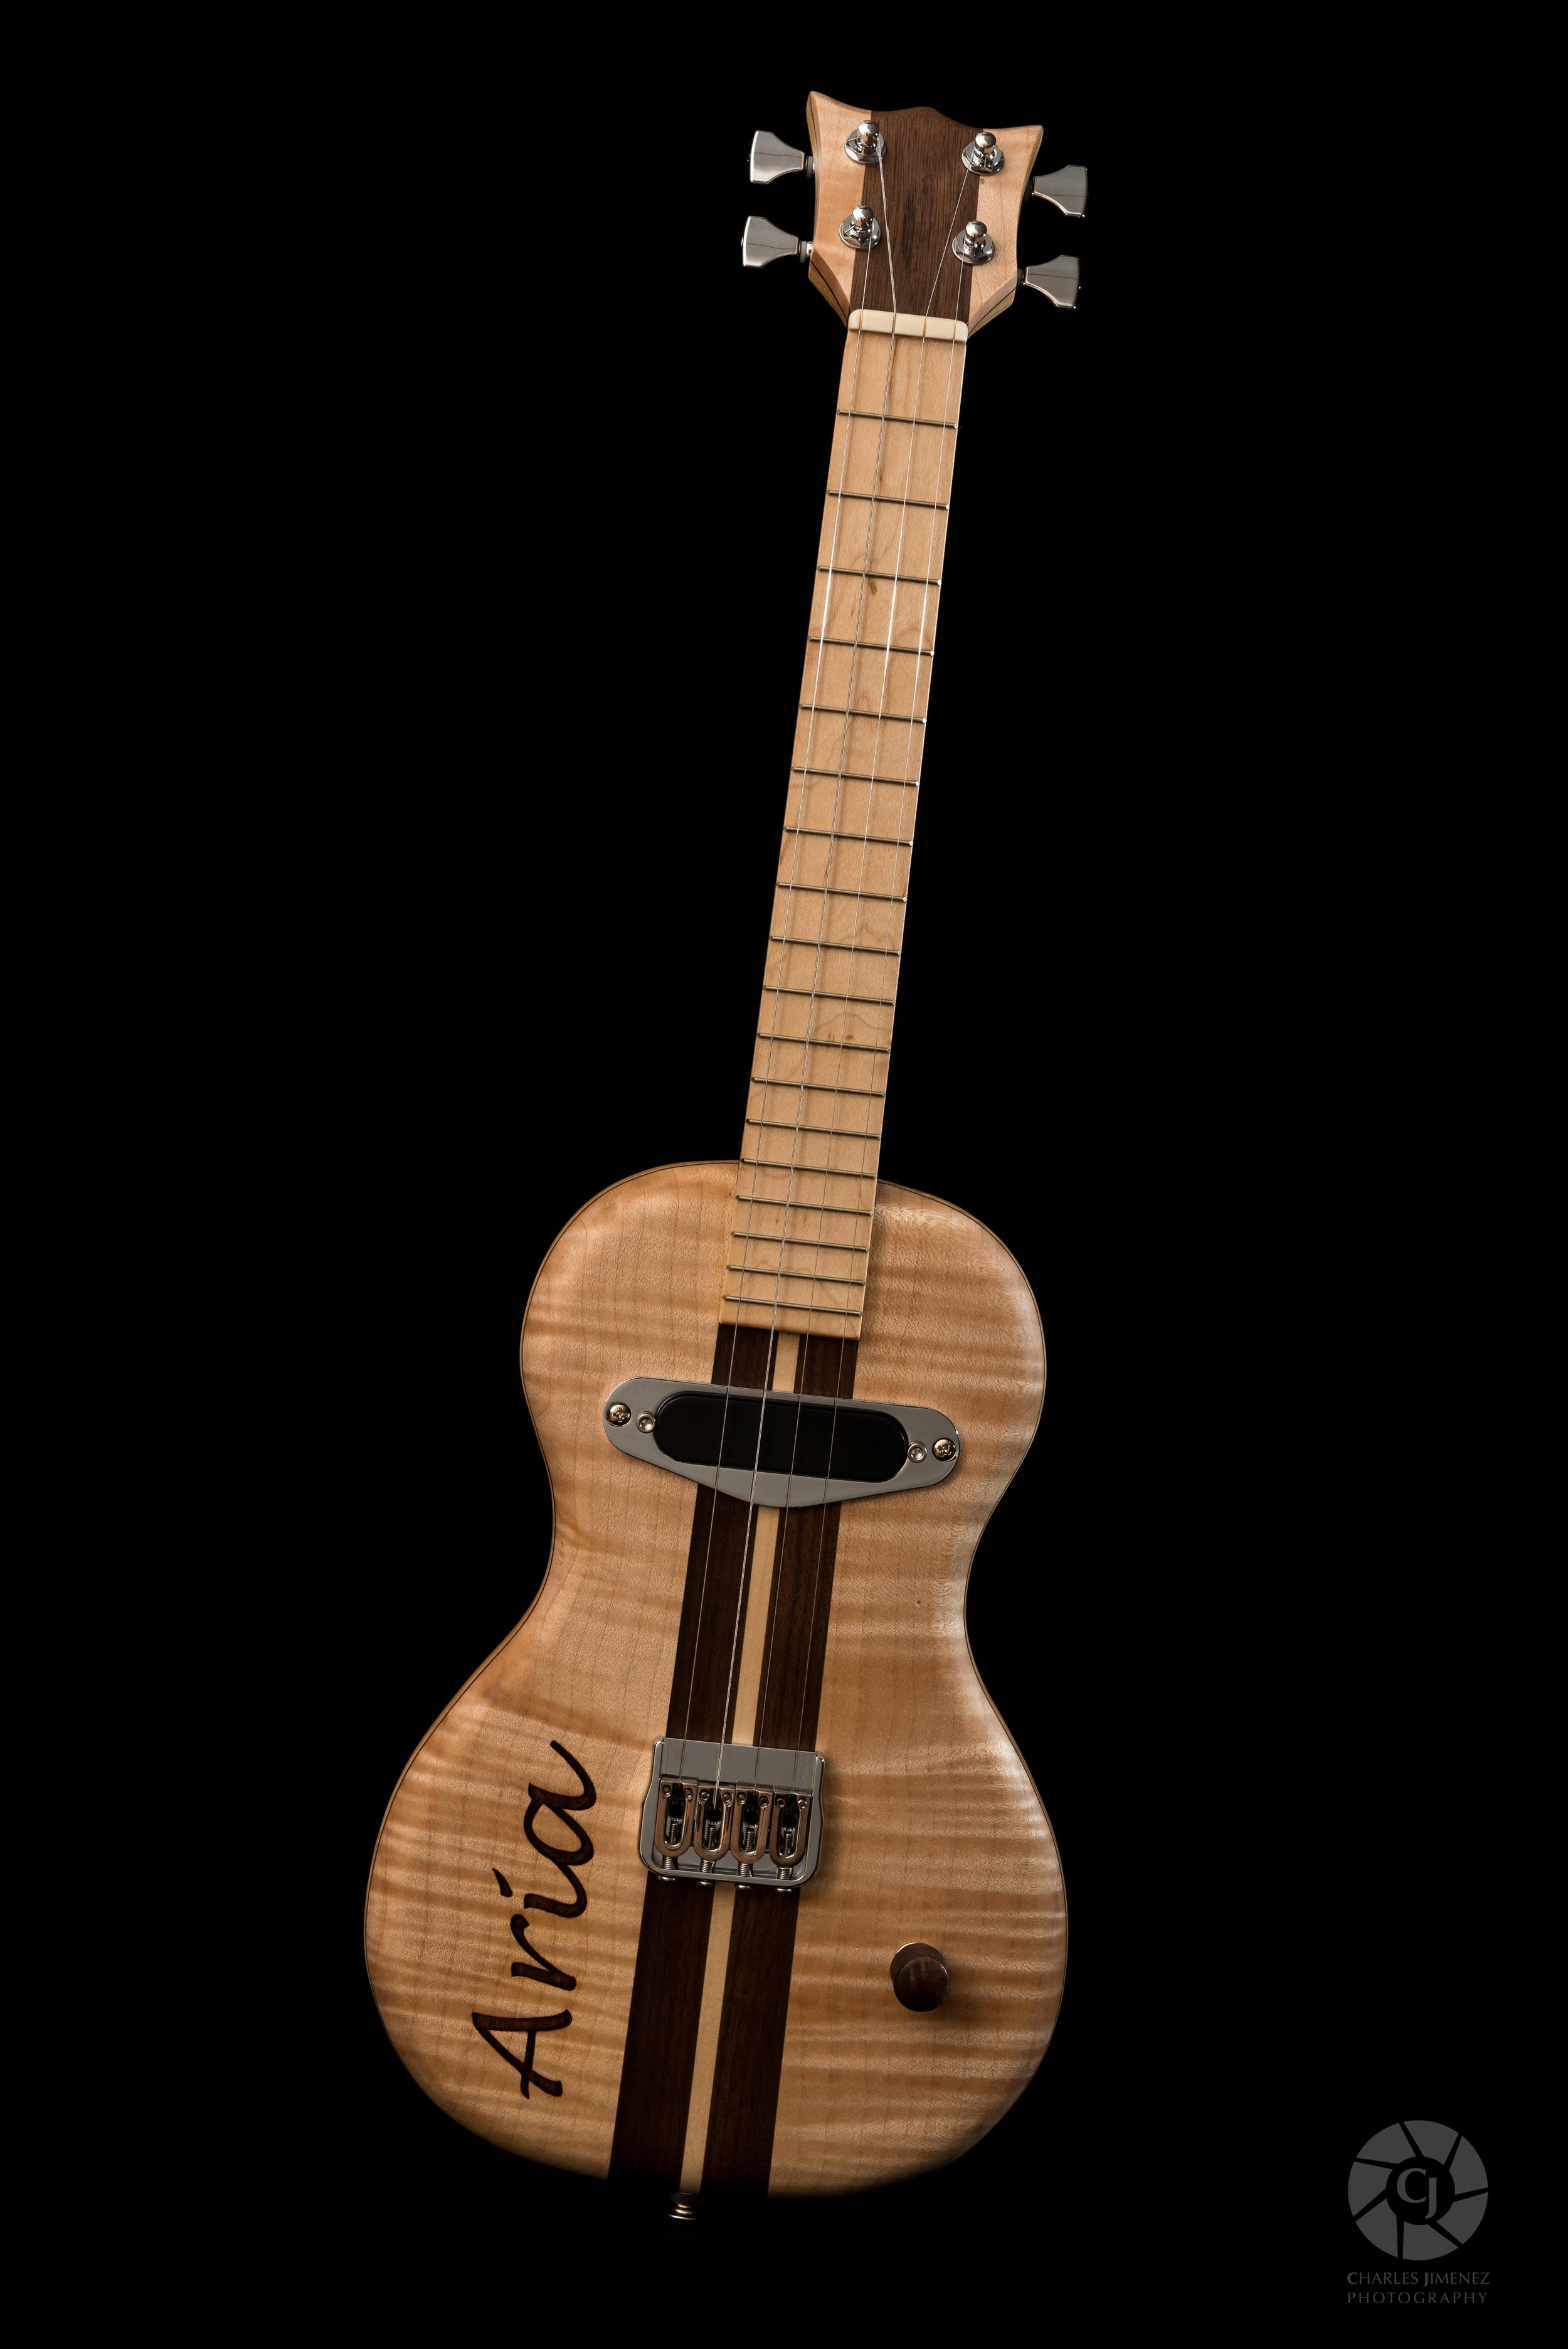 Better Mousetrap Guitars_Aria Ukulele_8-25-13_10.jpg